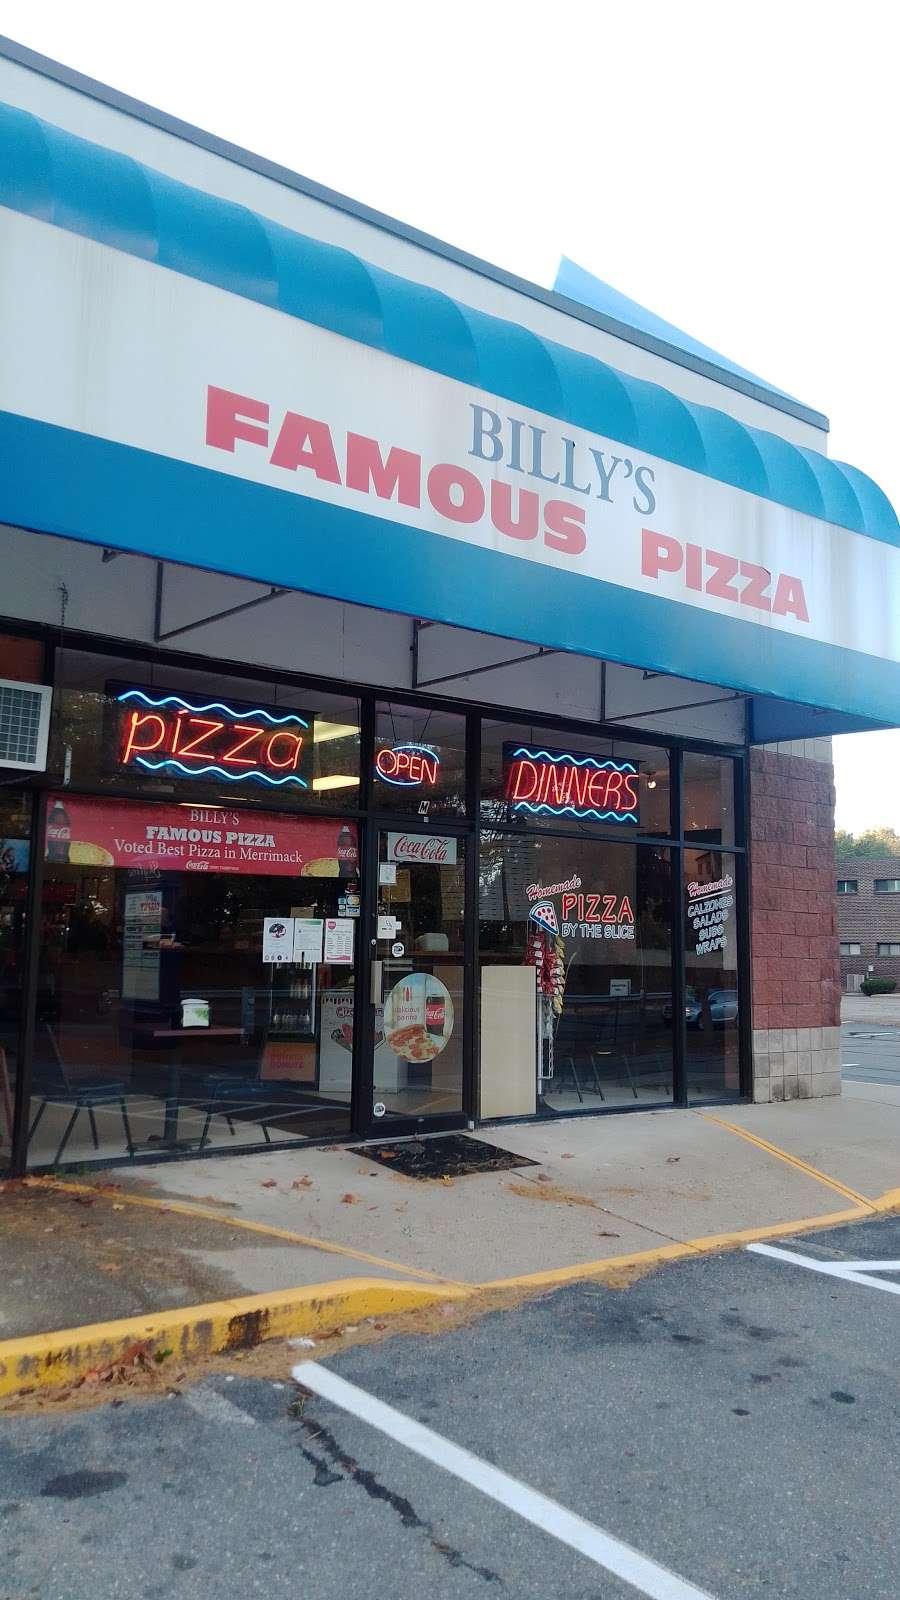 Billys Famous Pizza - restaurant  | Photo 7 of 7 | Address: 380 Daniel Webster Hwy, Merrimack, NH 03054, USA | Phone: (603) 424-4077